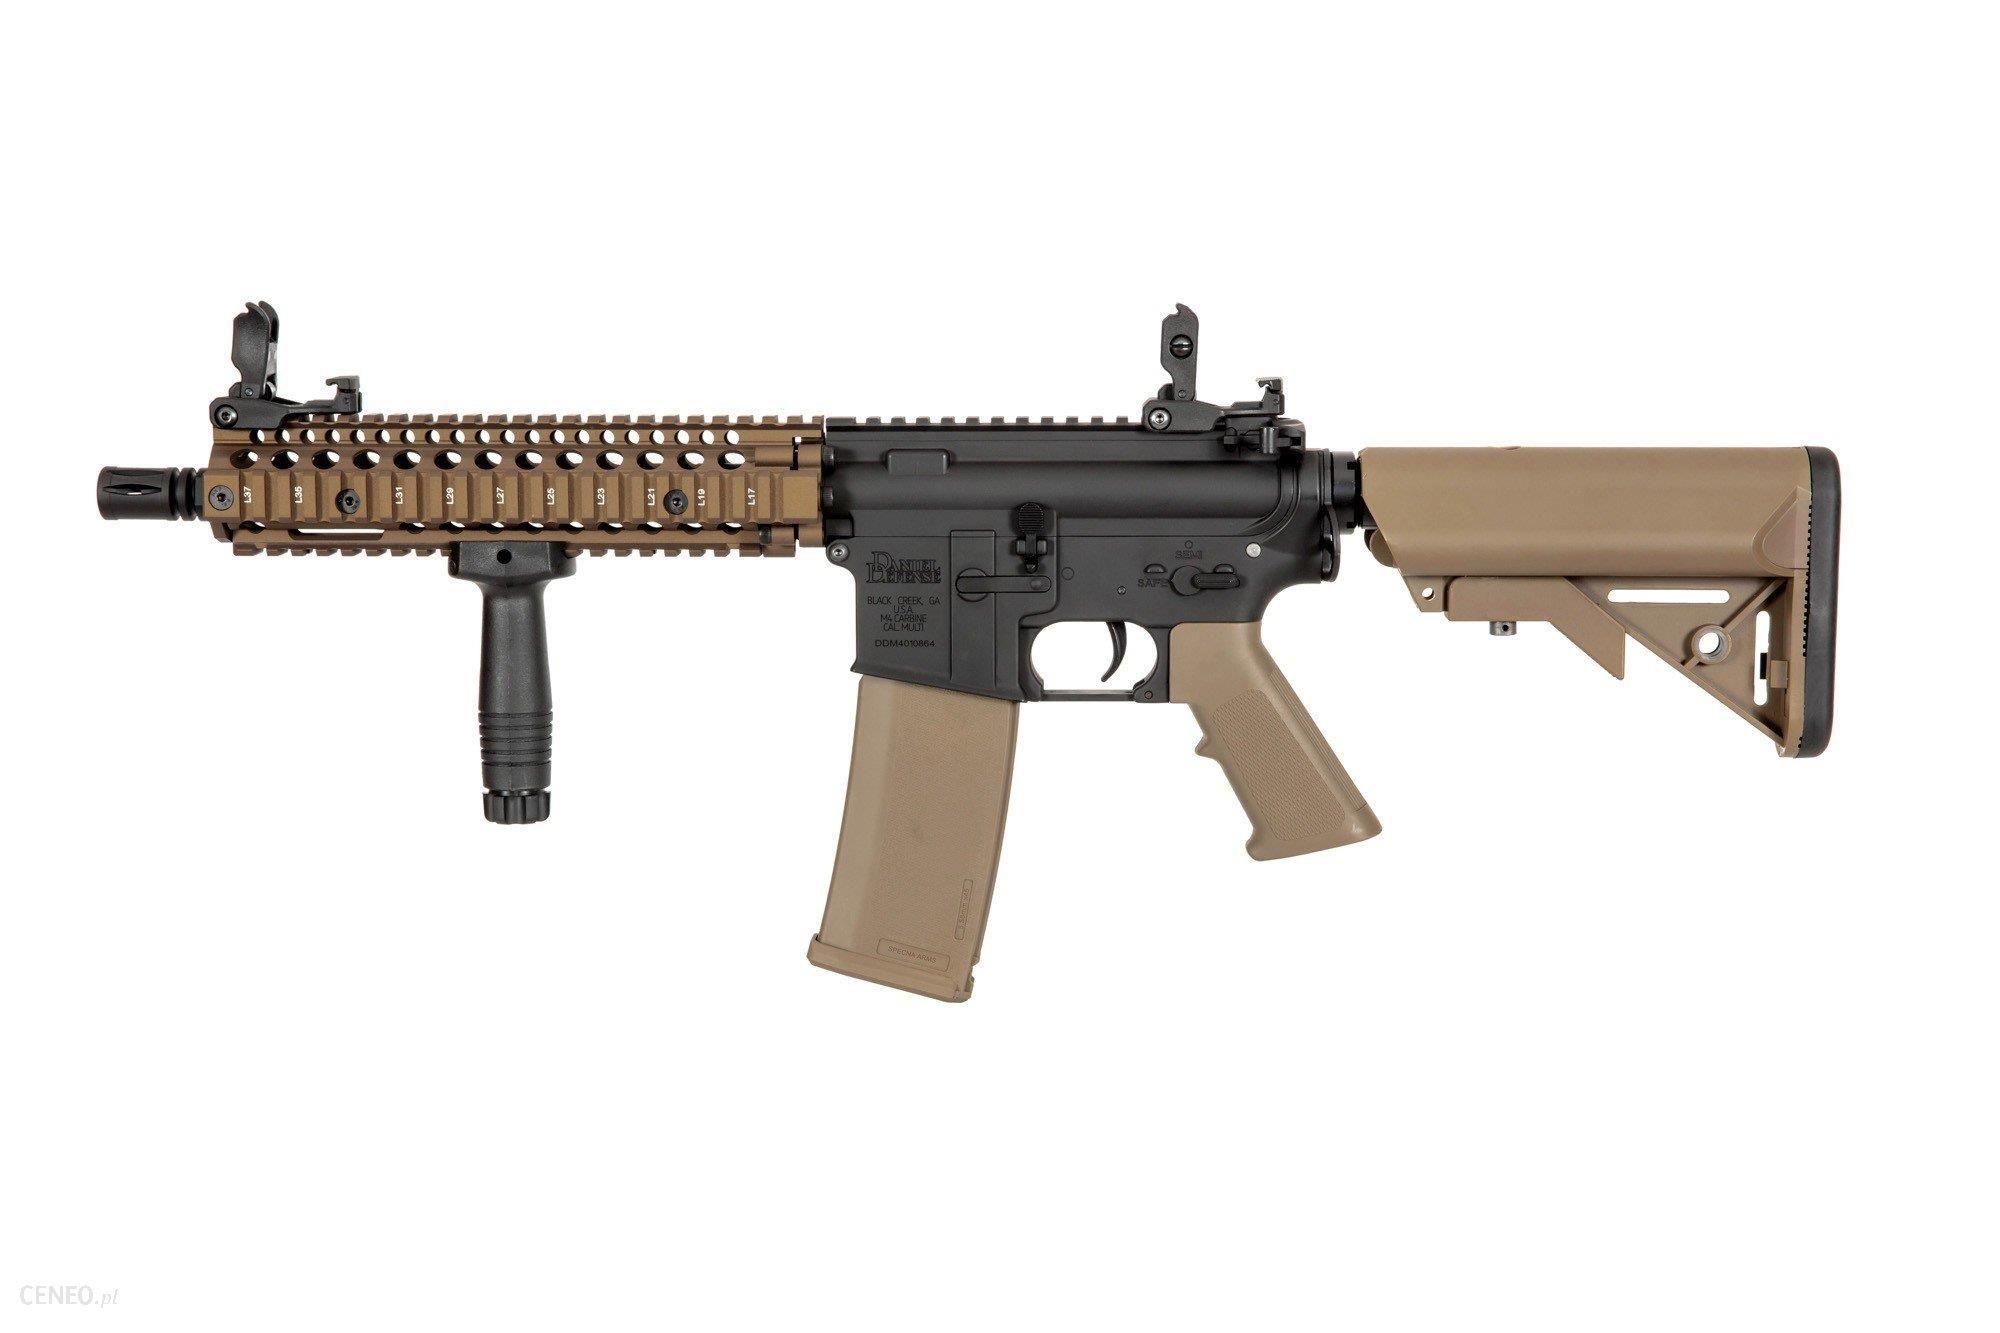 Specna Arms Karabinek Szturmowy Aeg Daniel Defense Mk18 Sa-E19 Edge Chaos Bronze (Spe-01-029642)G